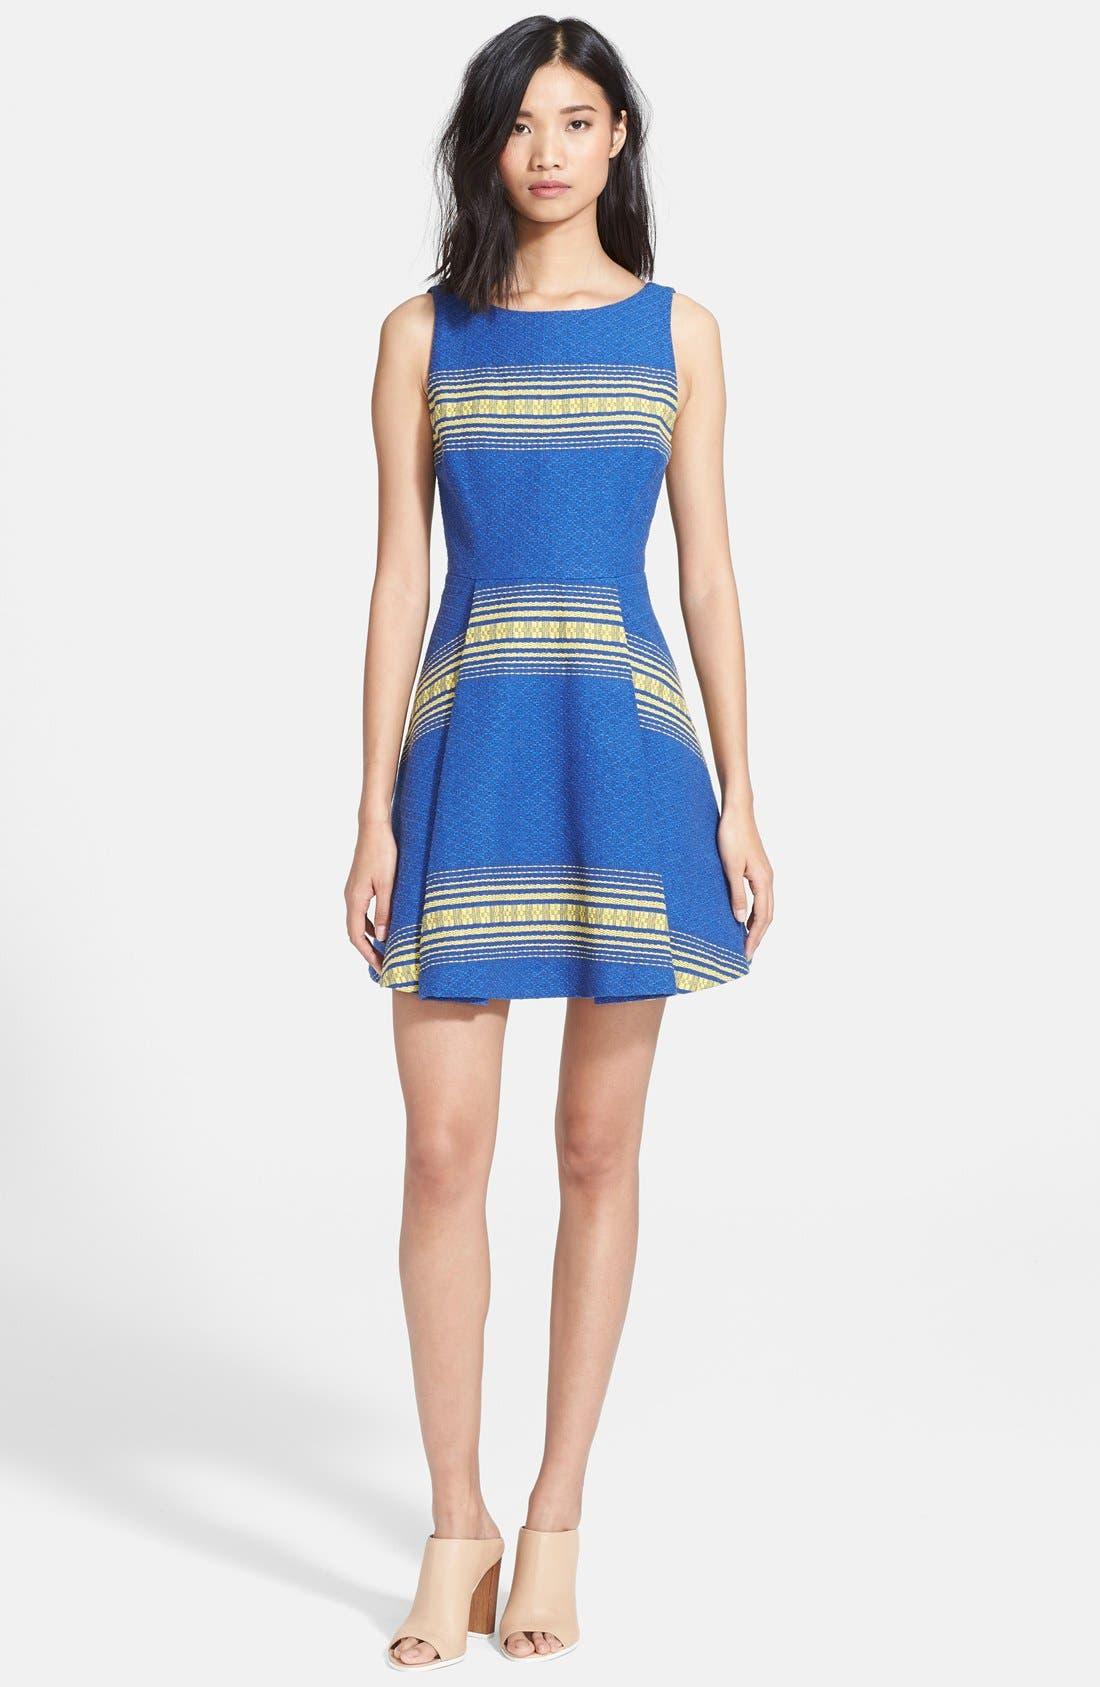 Alternate Image 1 Selected - Alice + Olivia 'Holis' Cotton Fit & Flare Dress